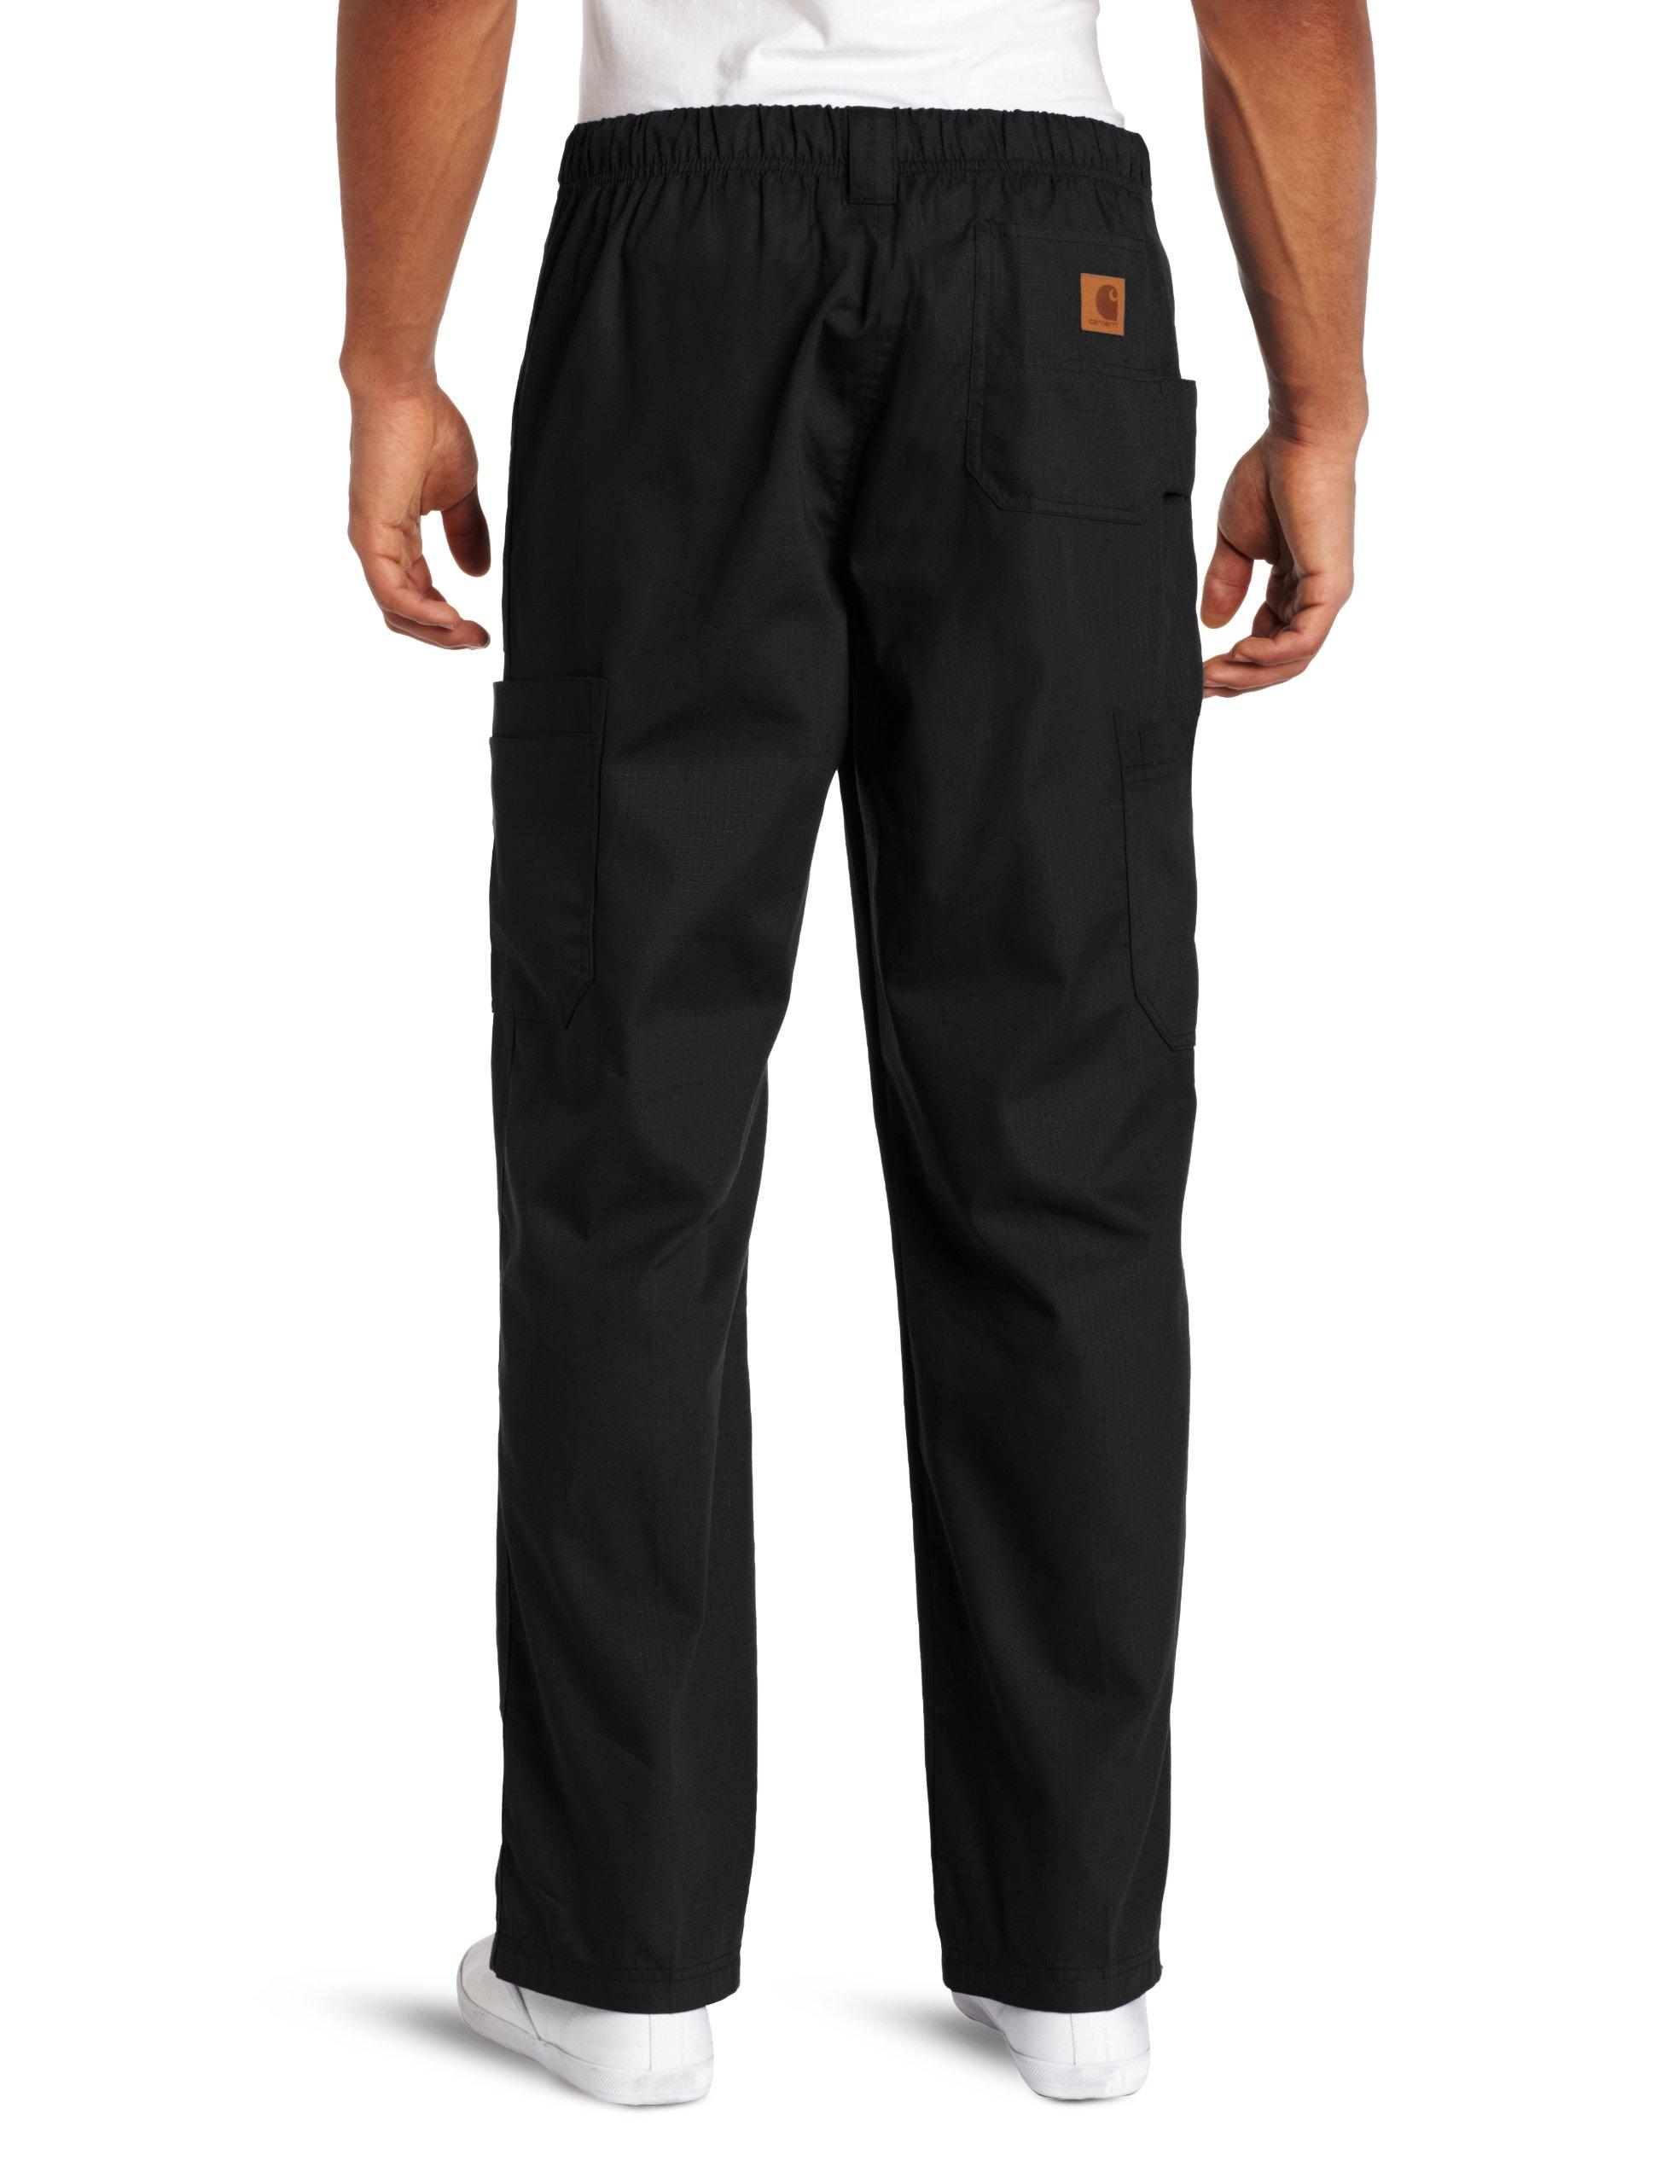 Carhartt Men's Ripstop Multi-Cargo Scrub Pant, Black, Large by Carhartt (Image #2)